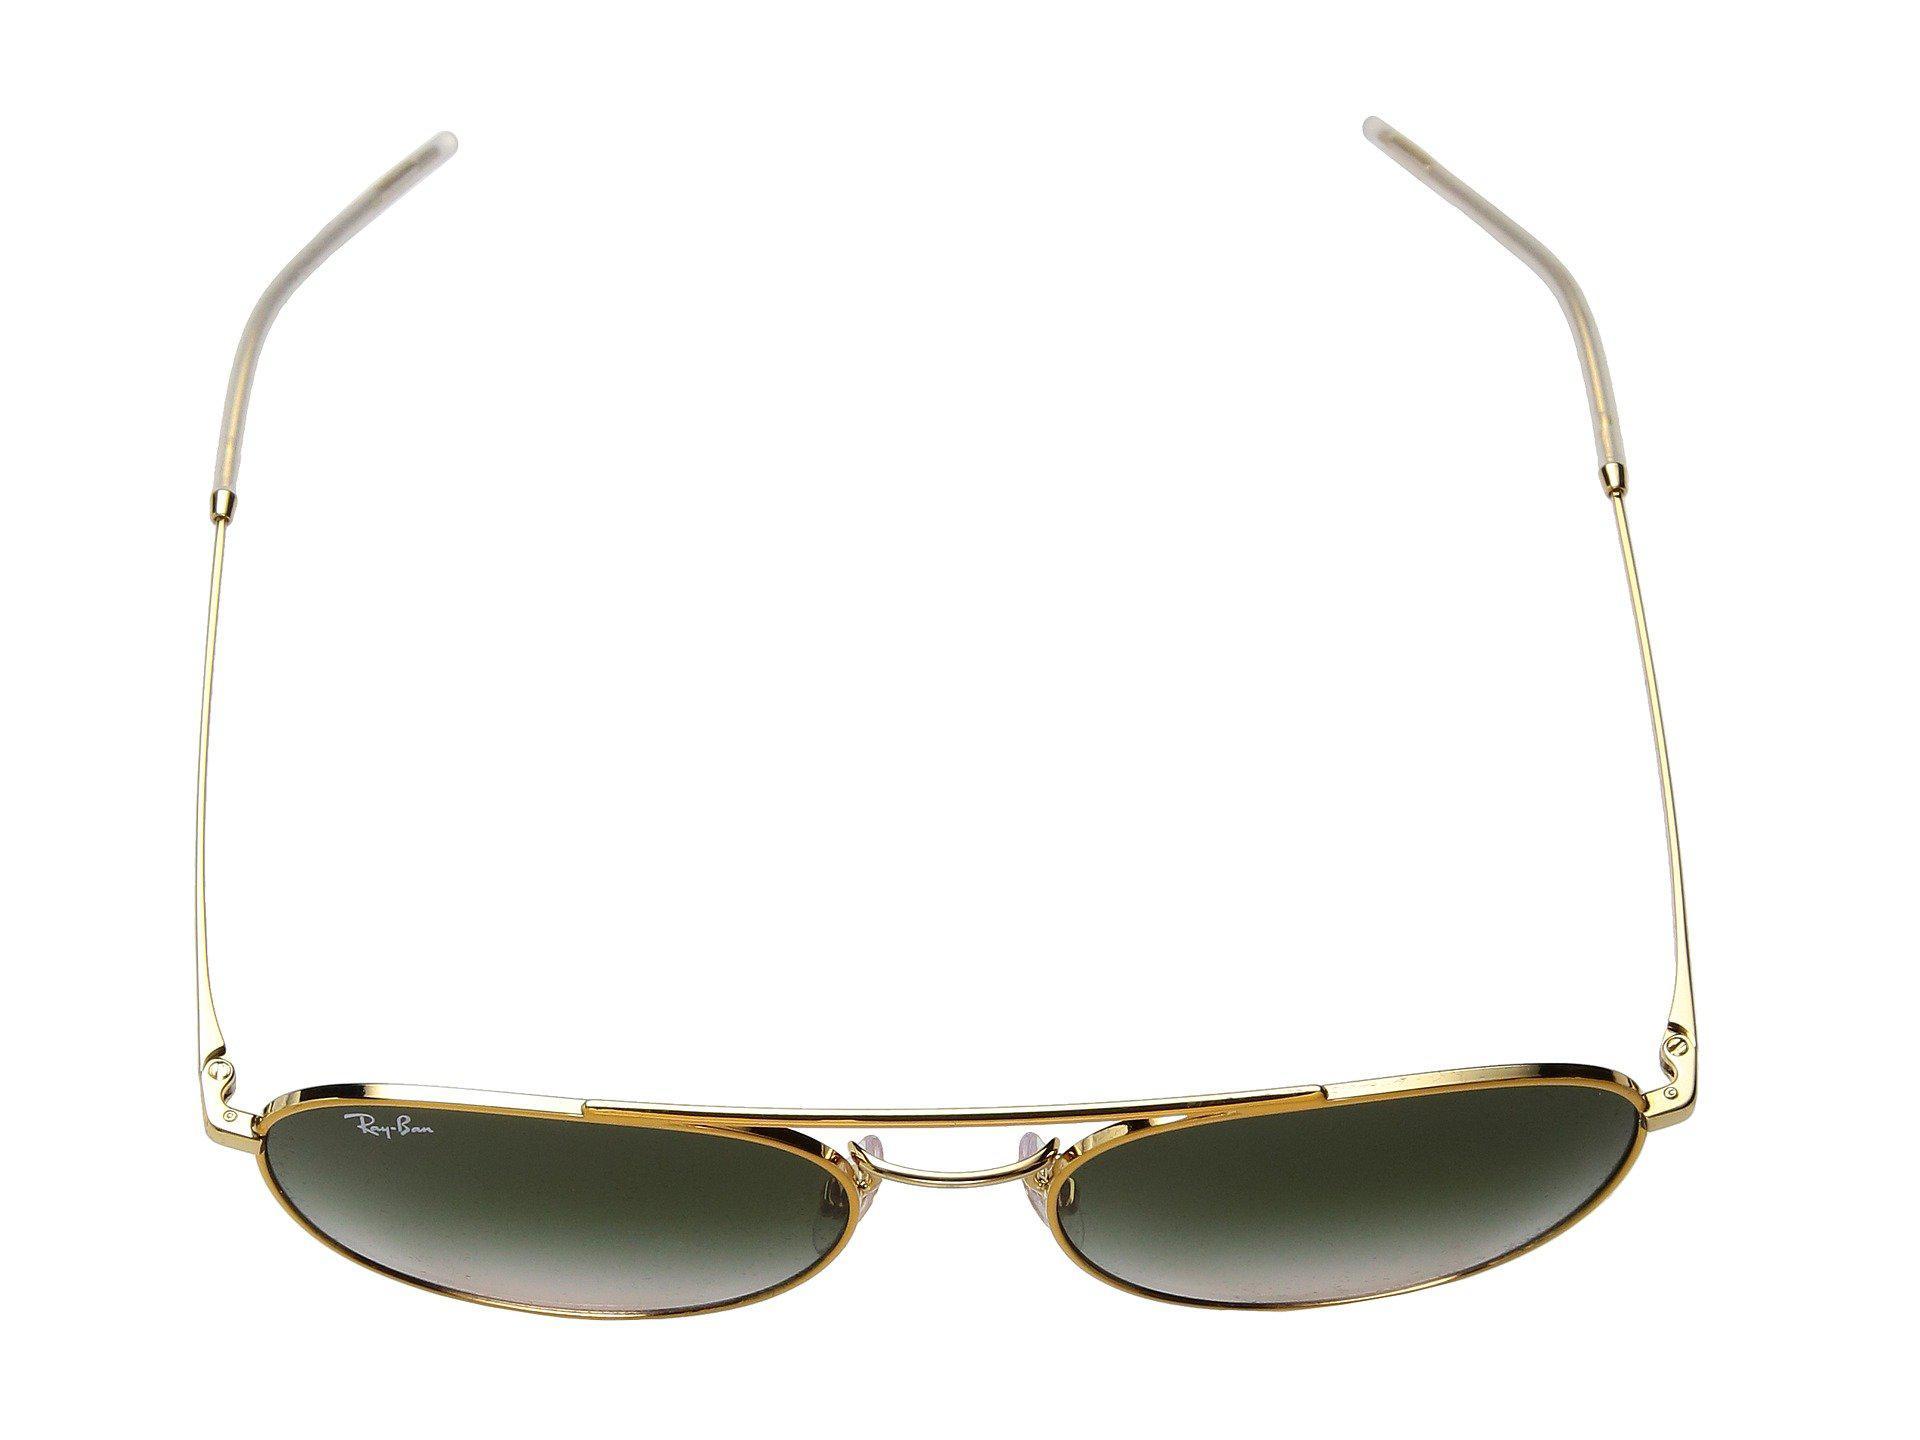 67f835cbab6 Lyst - Ray-Ban Rb3589 55mm (yellow light Brown Gradient) Fashion ...